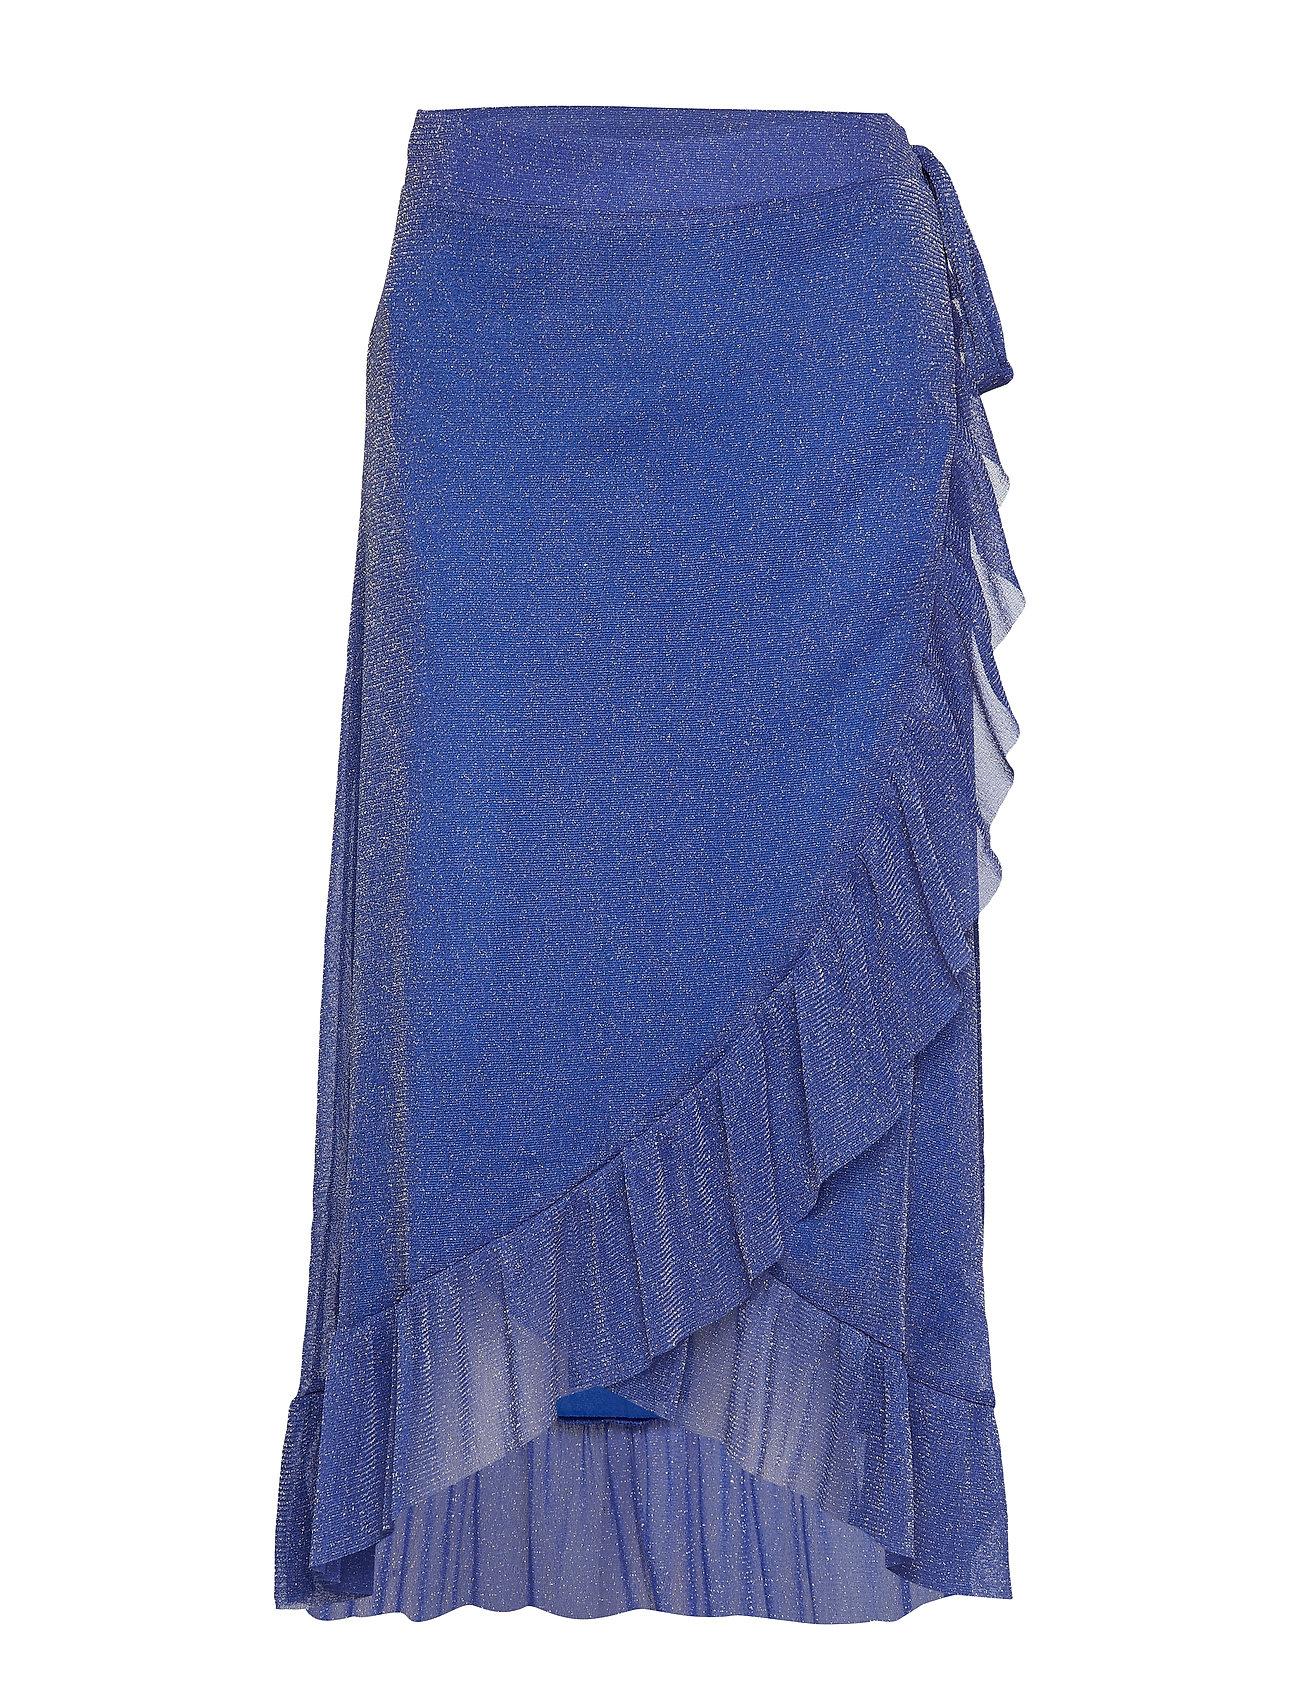 Résumé Ninnet skirt - ELECTRIC BLUE